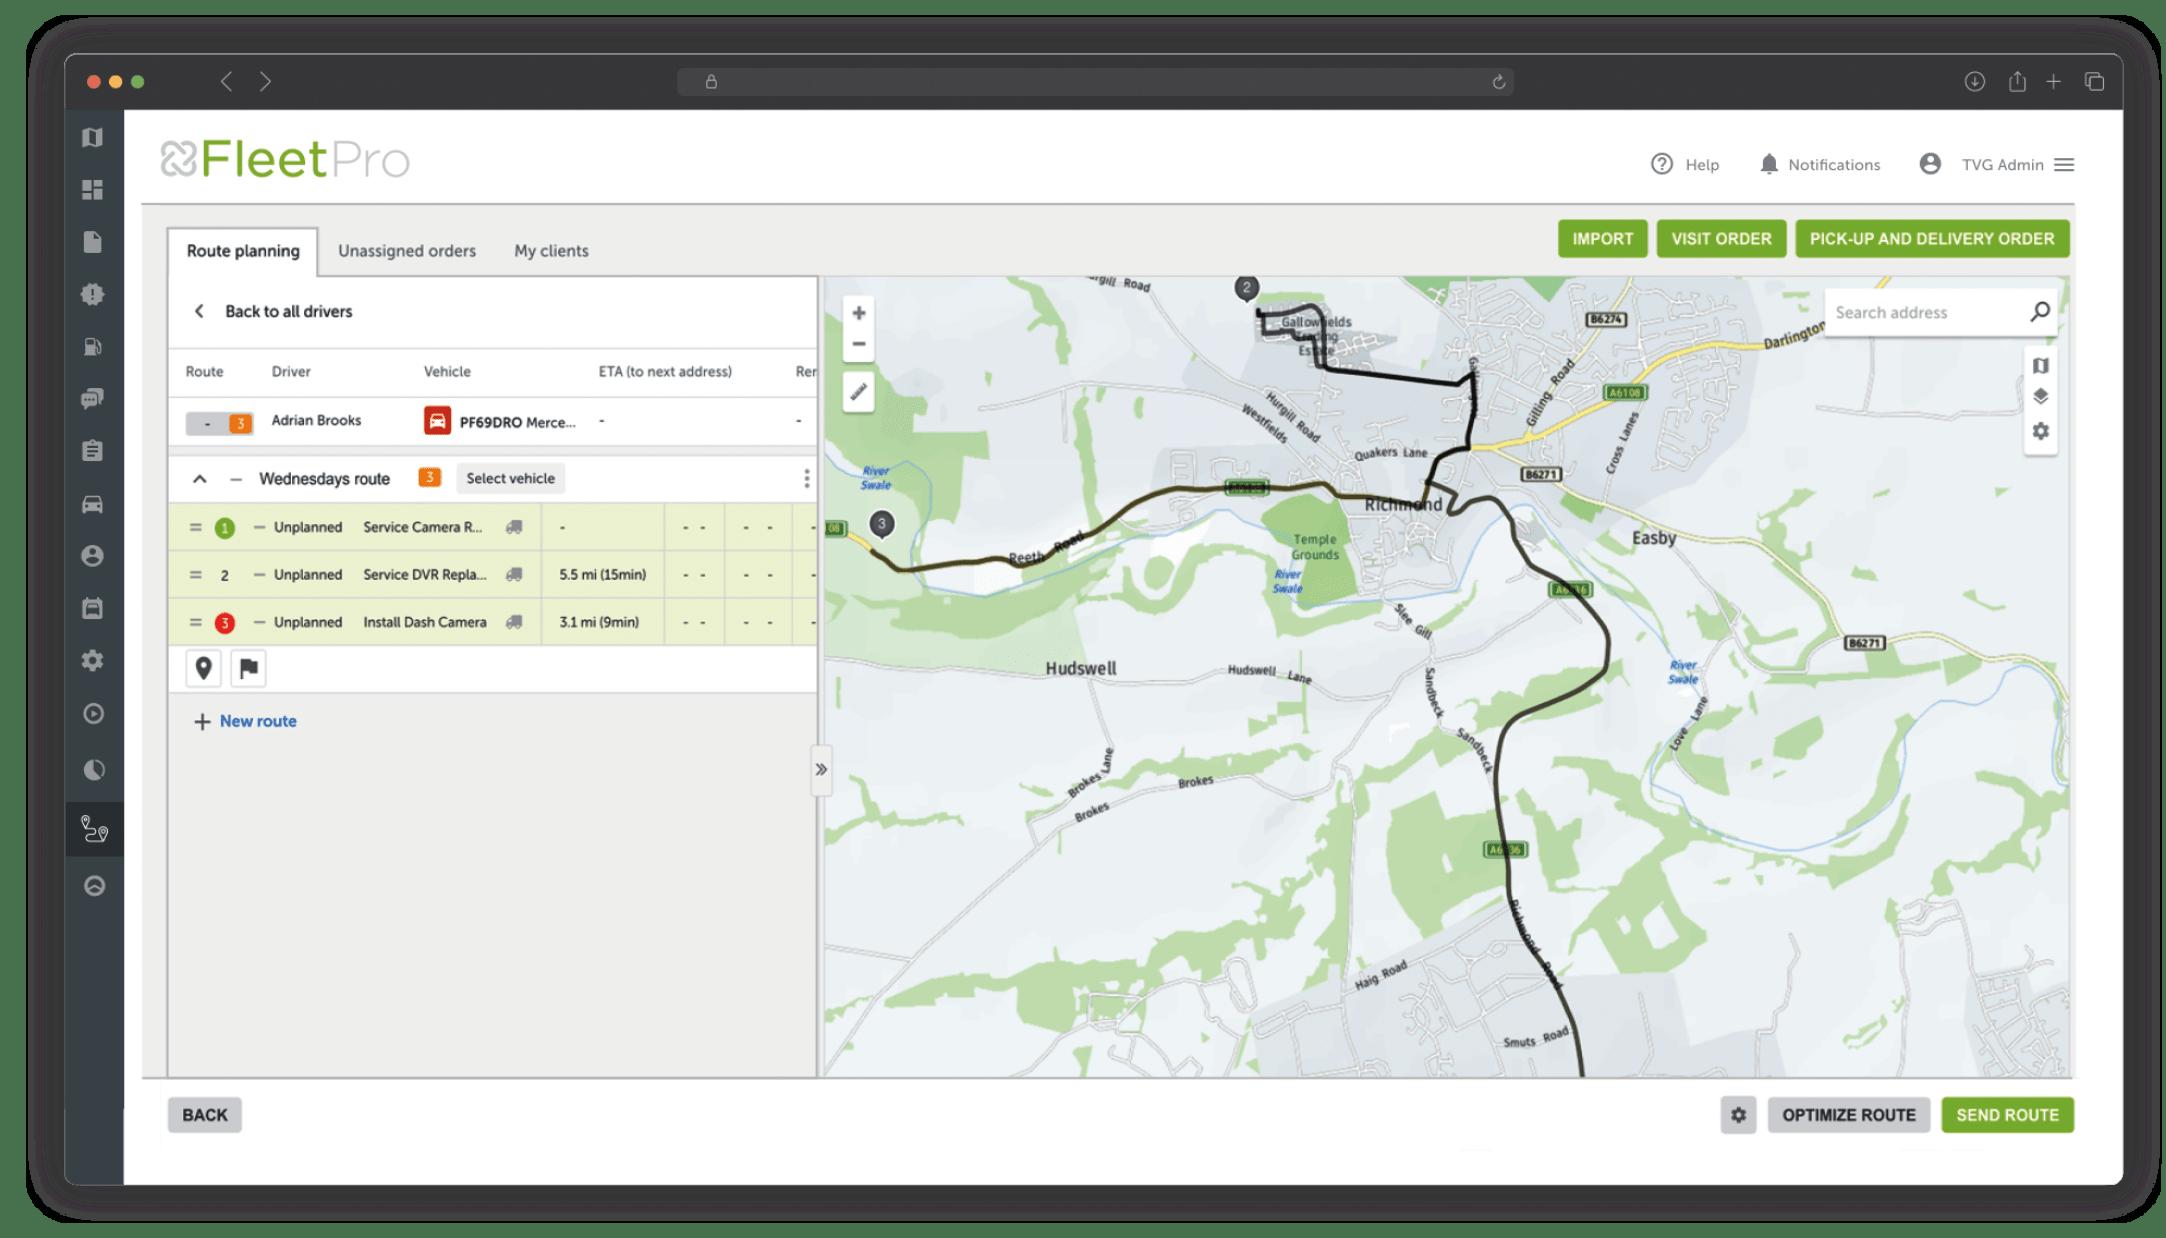 fleet-pro-map